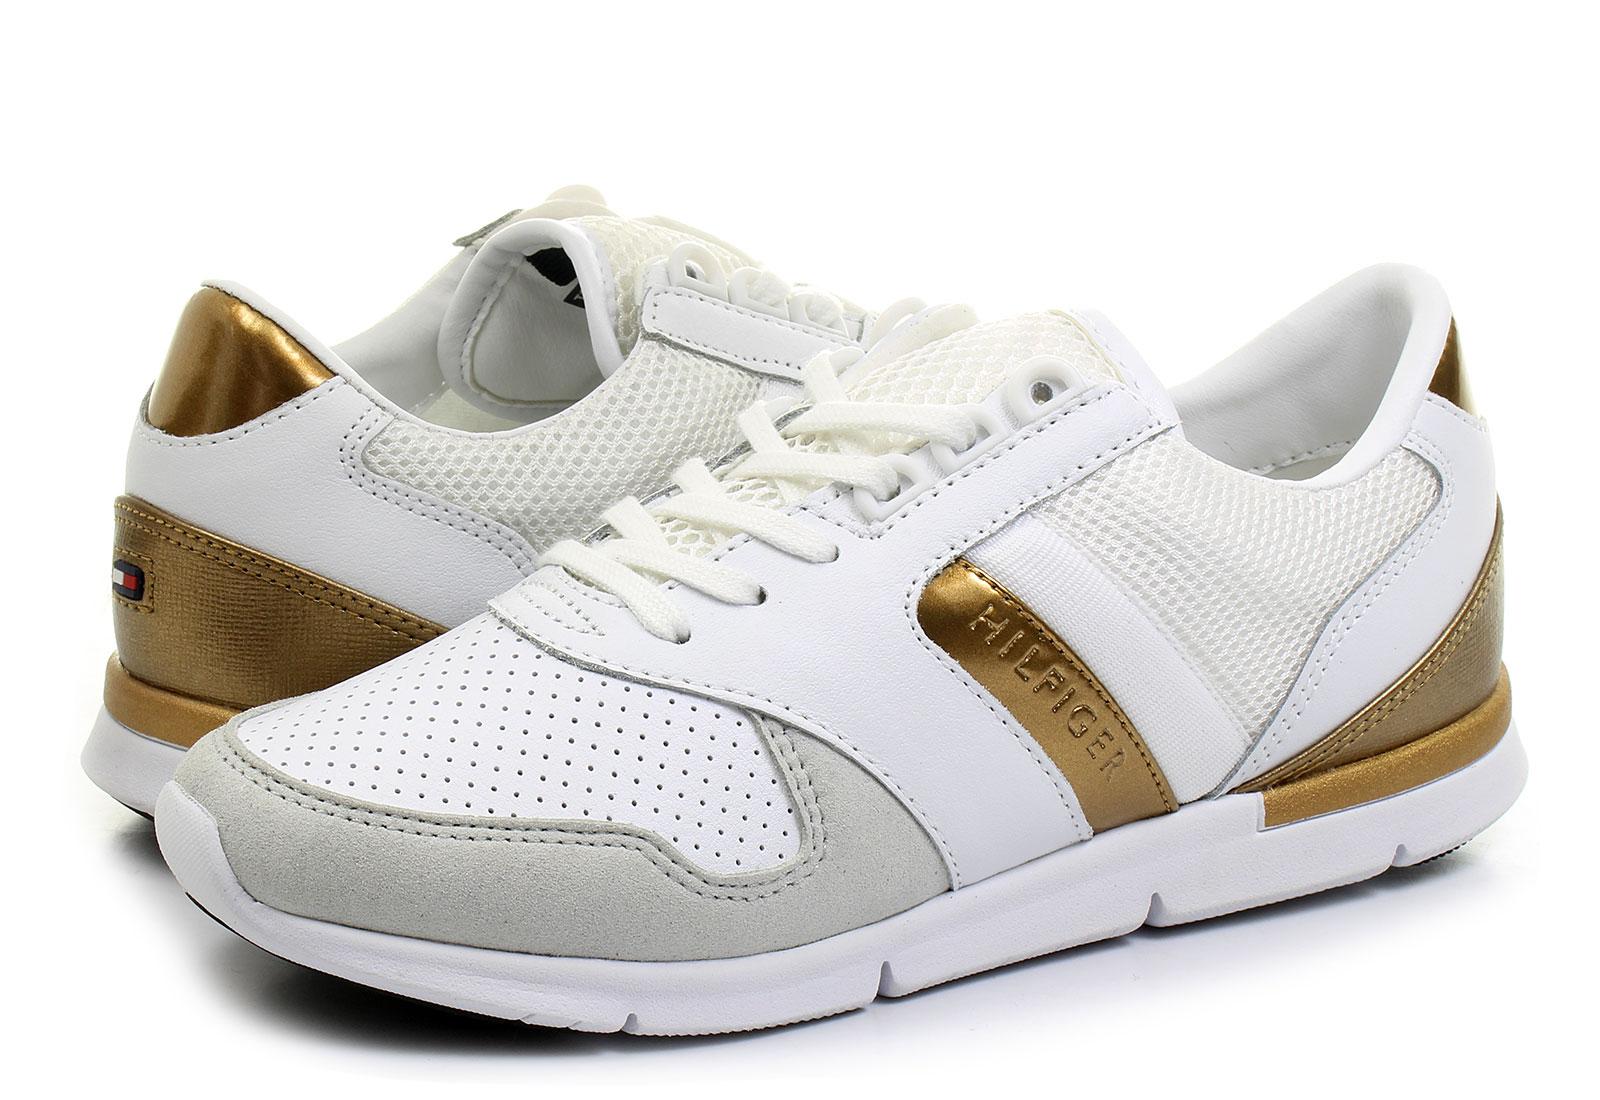 New York Shoes Shop Online